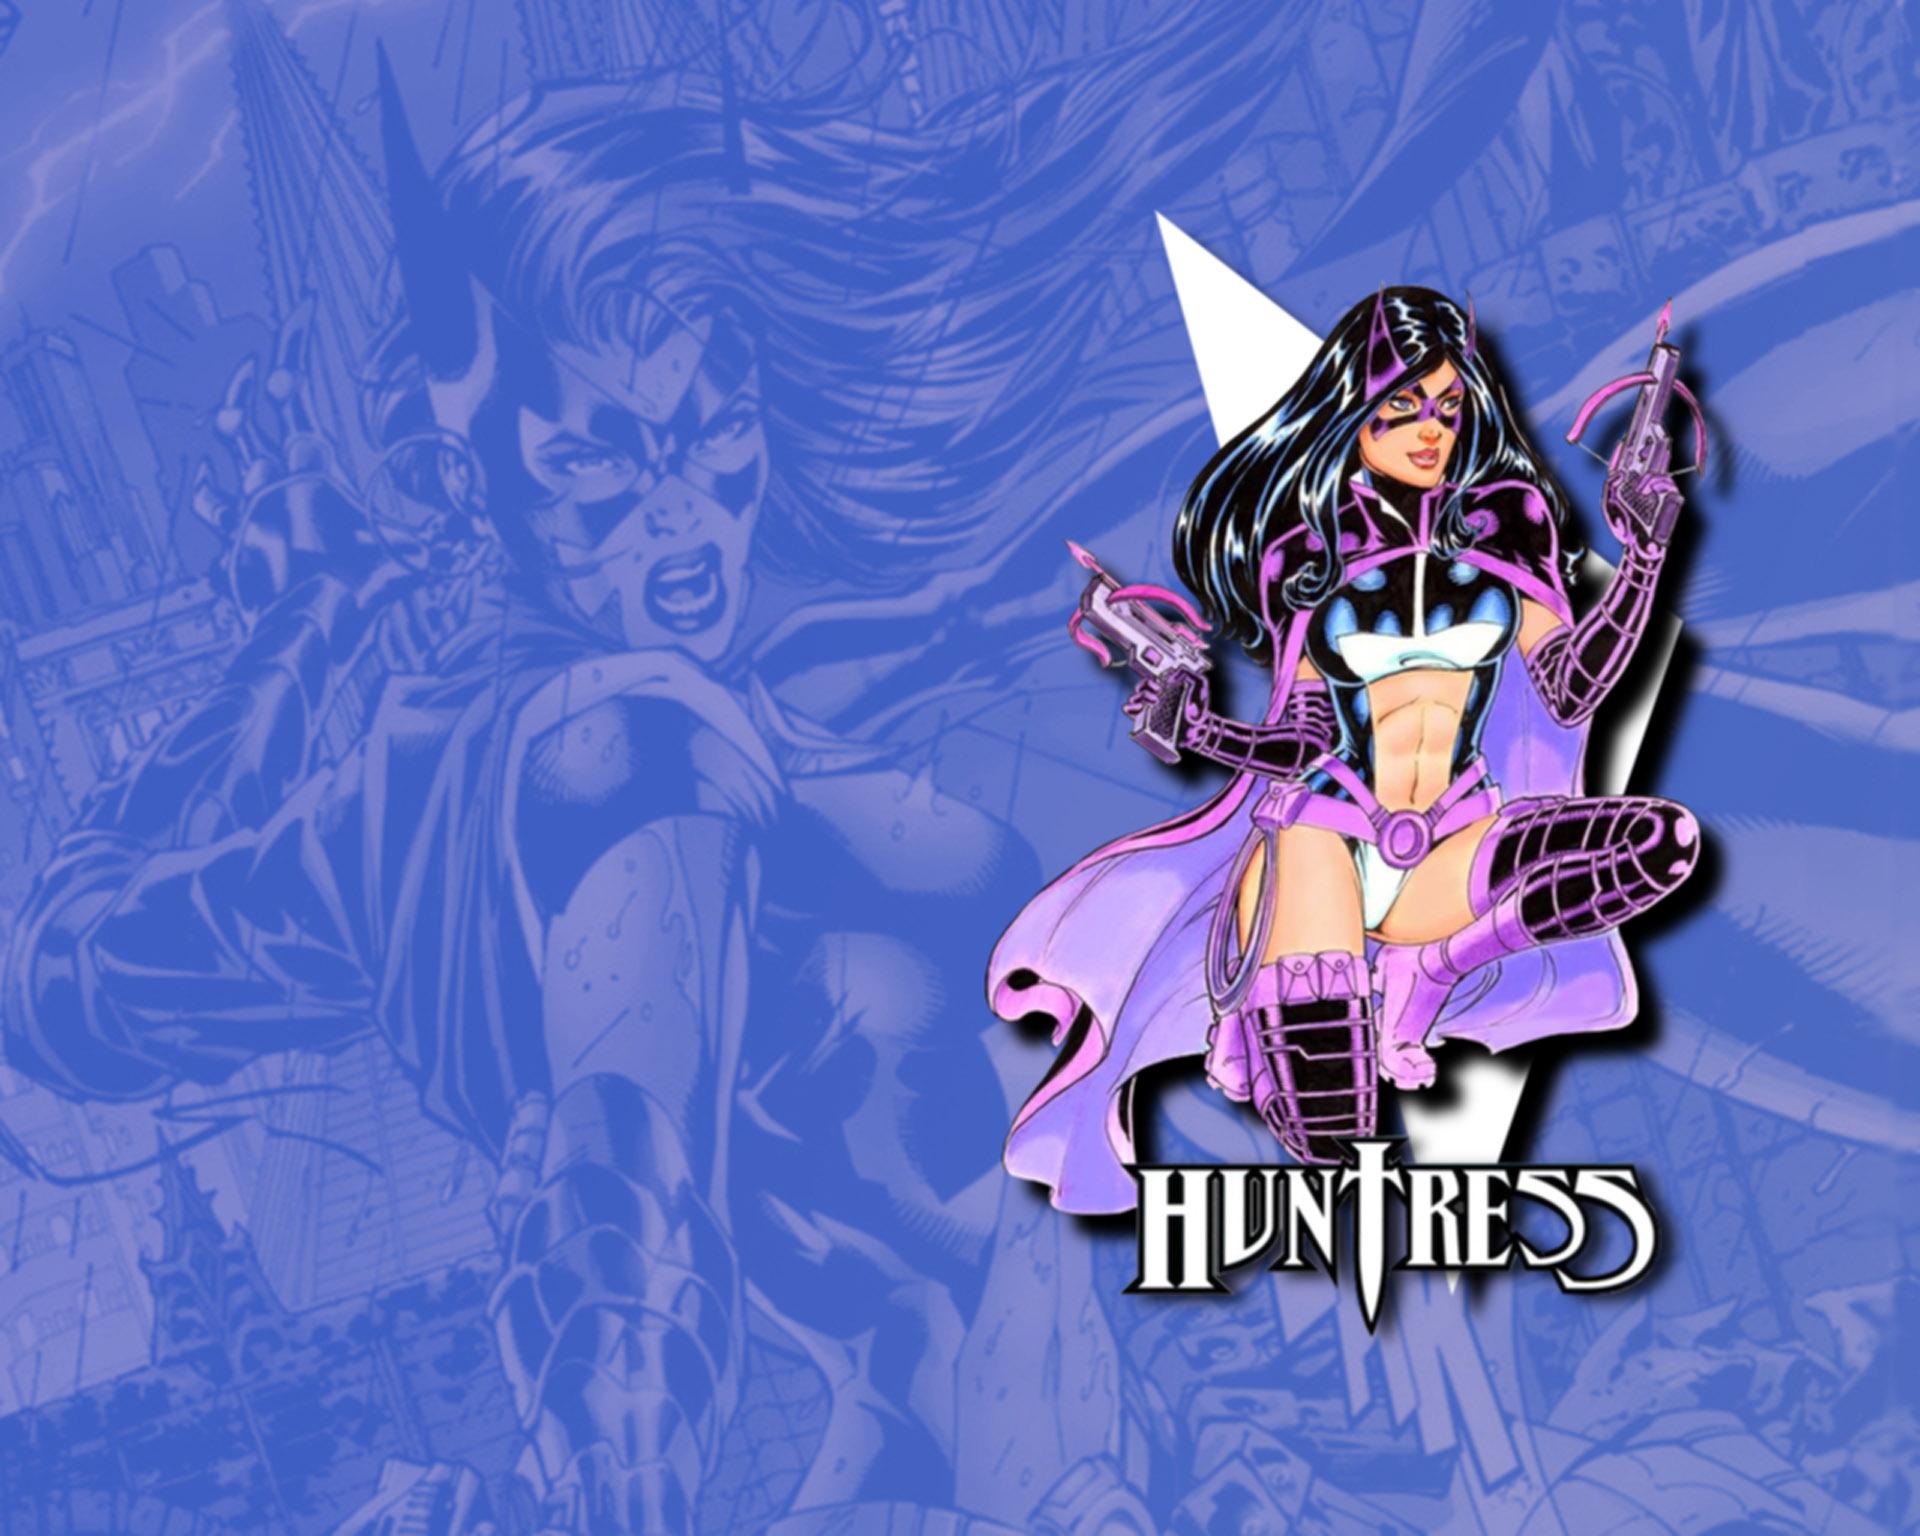 Huntress HD Wallpaper | Background Image | 1920x1536 | ID ...  Huntress